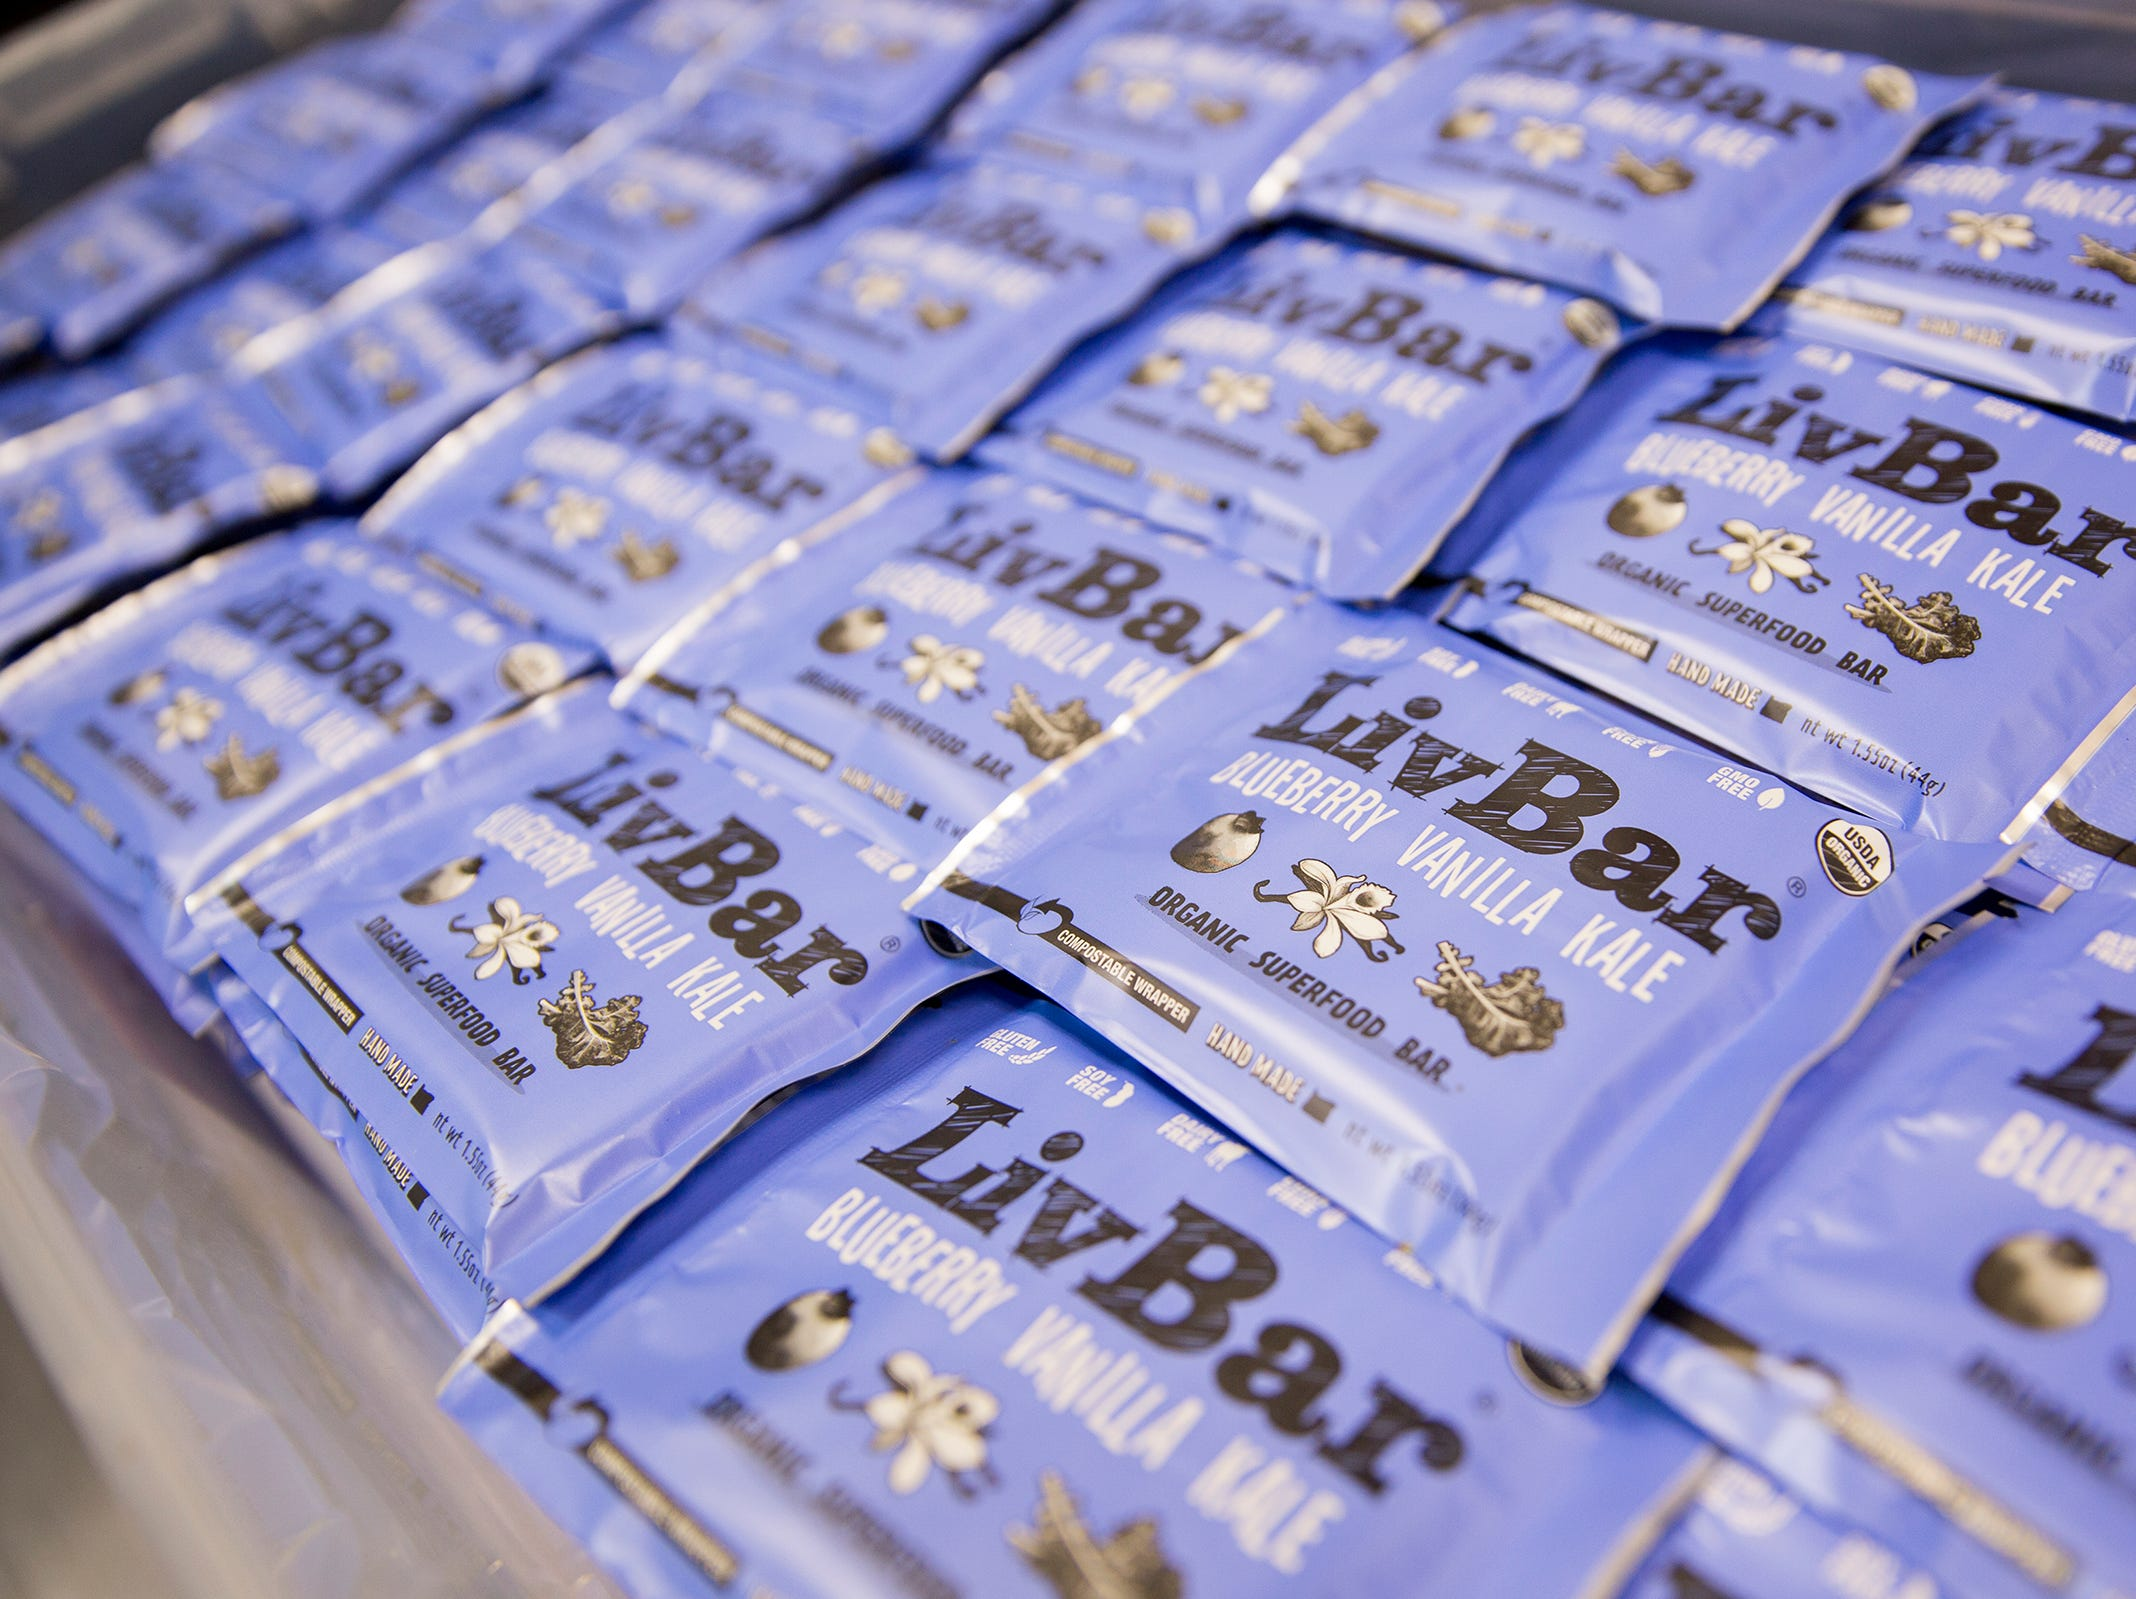 Blueberry vanilla kale LivBar energy bars are stored in downtown Salem on Wednesday, Feb. 20, 2019.